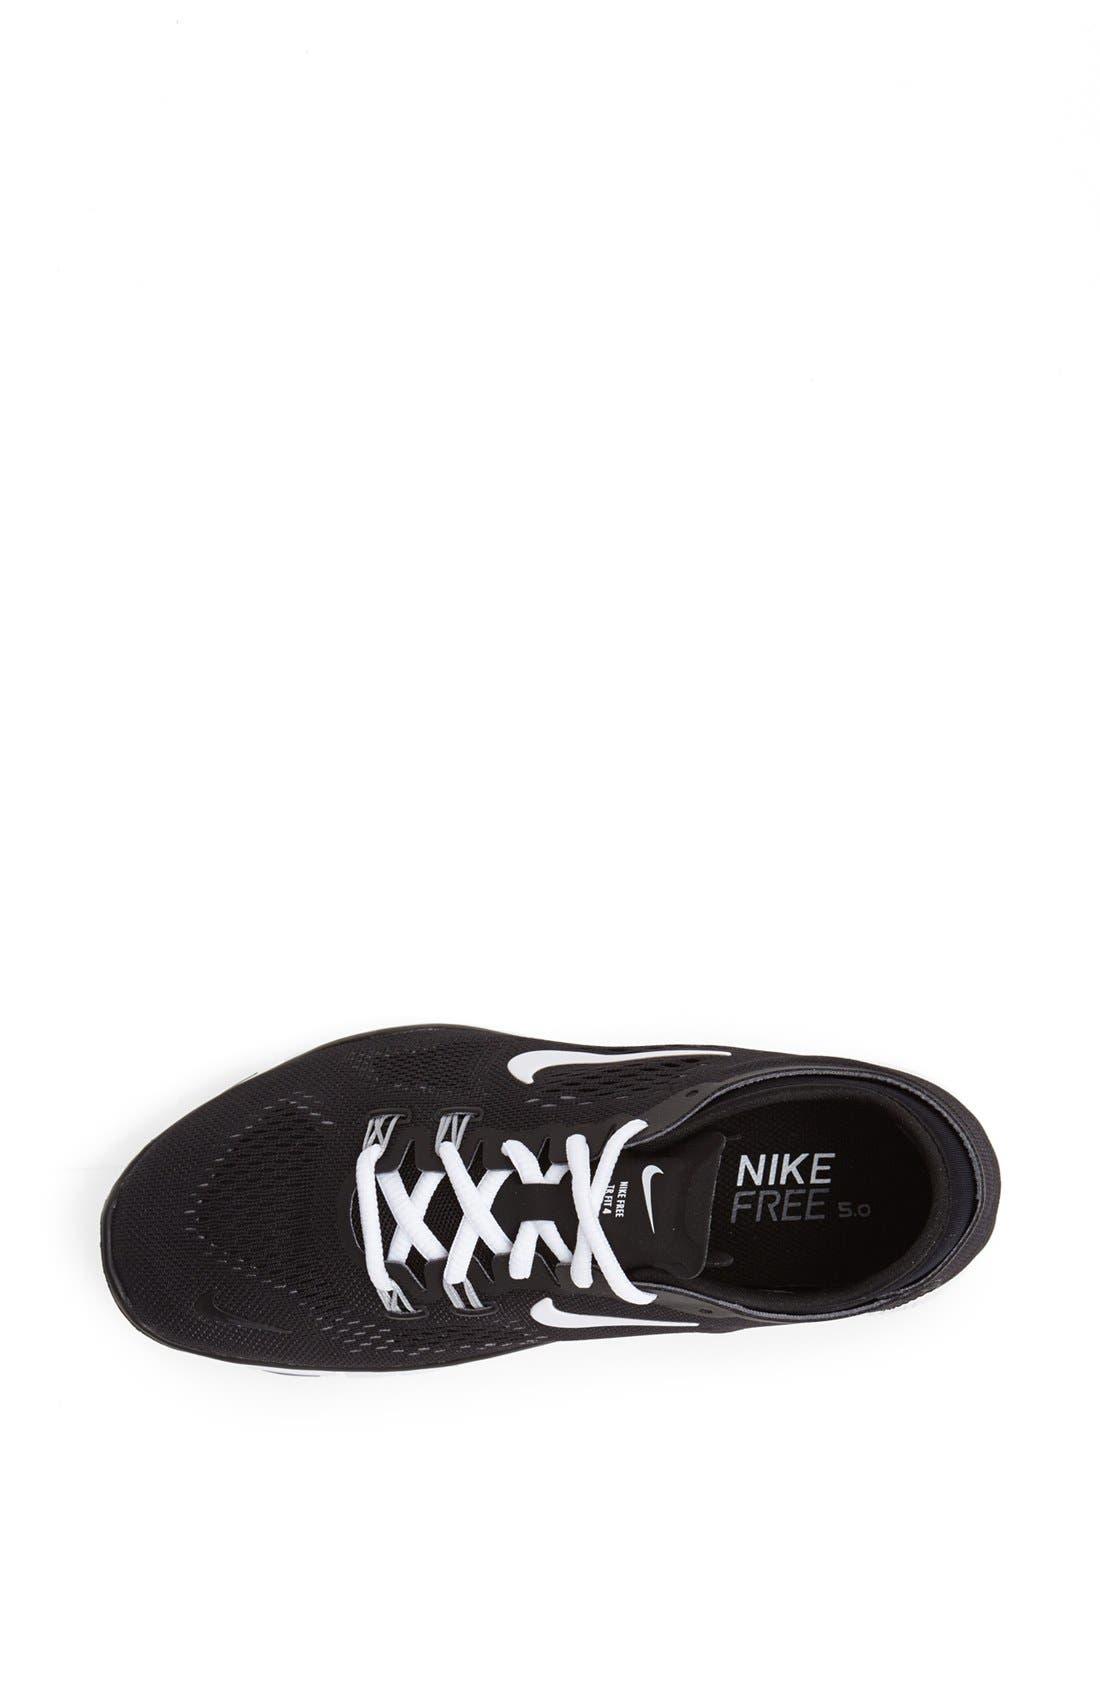 Alternate Image 3  - Nike 'Free 5.0 TR Fit 4' Training Shoe (Women)